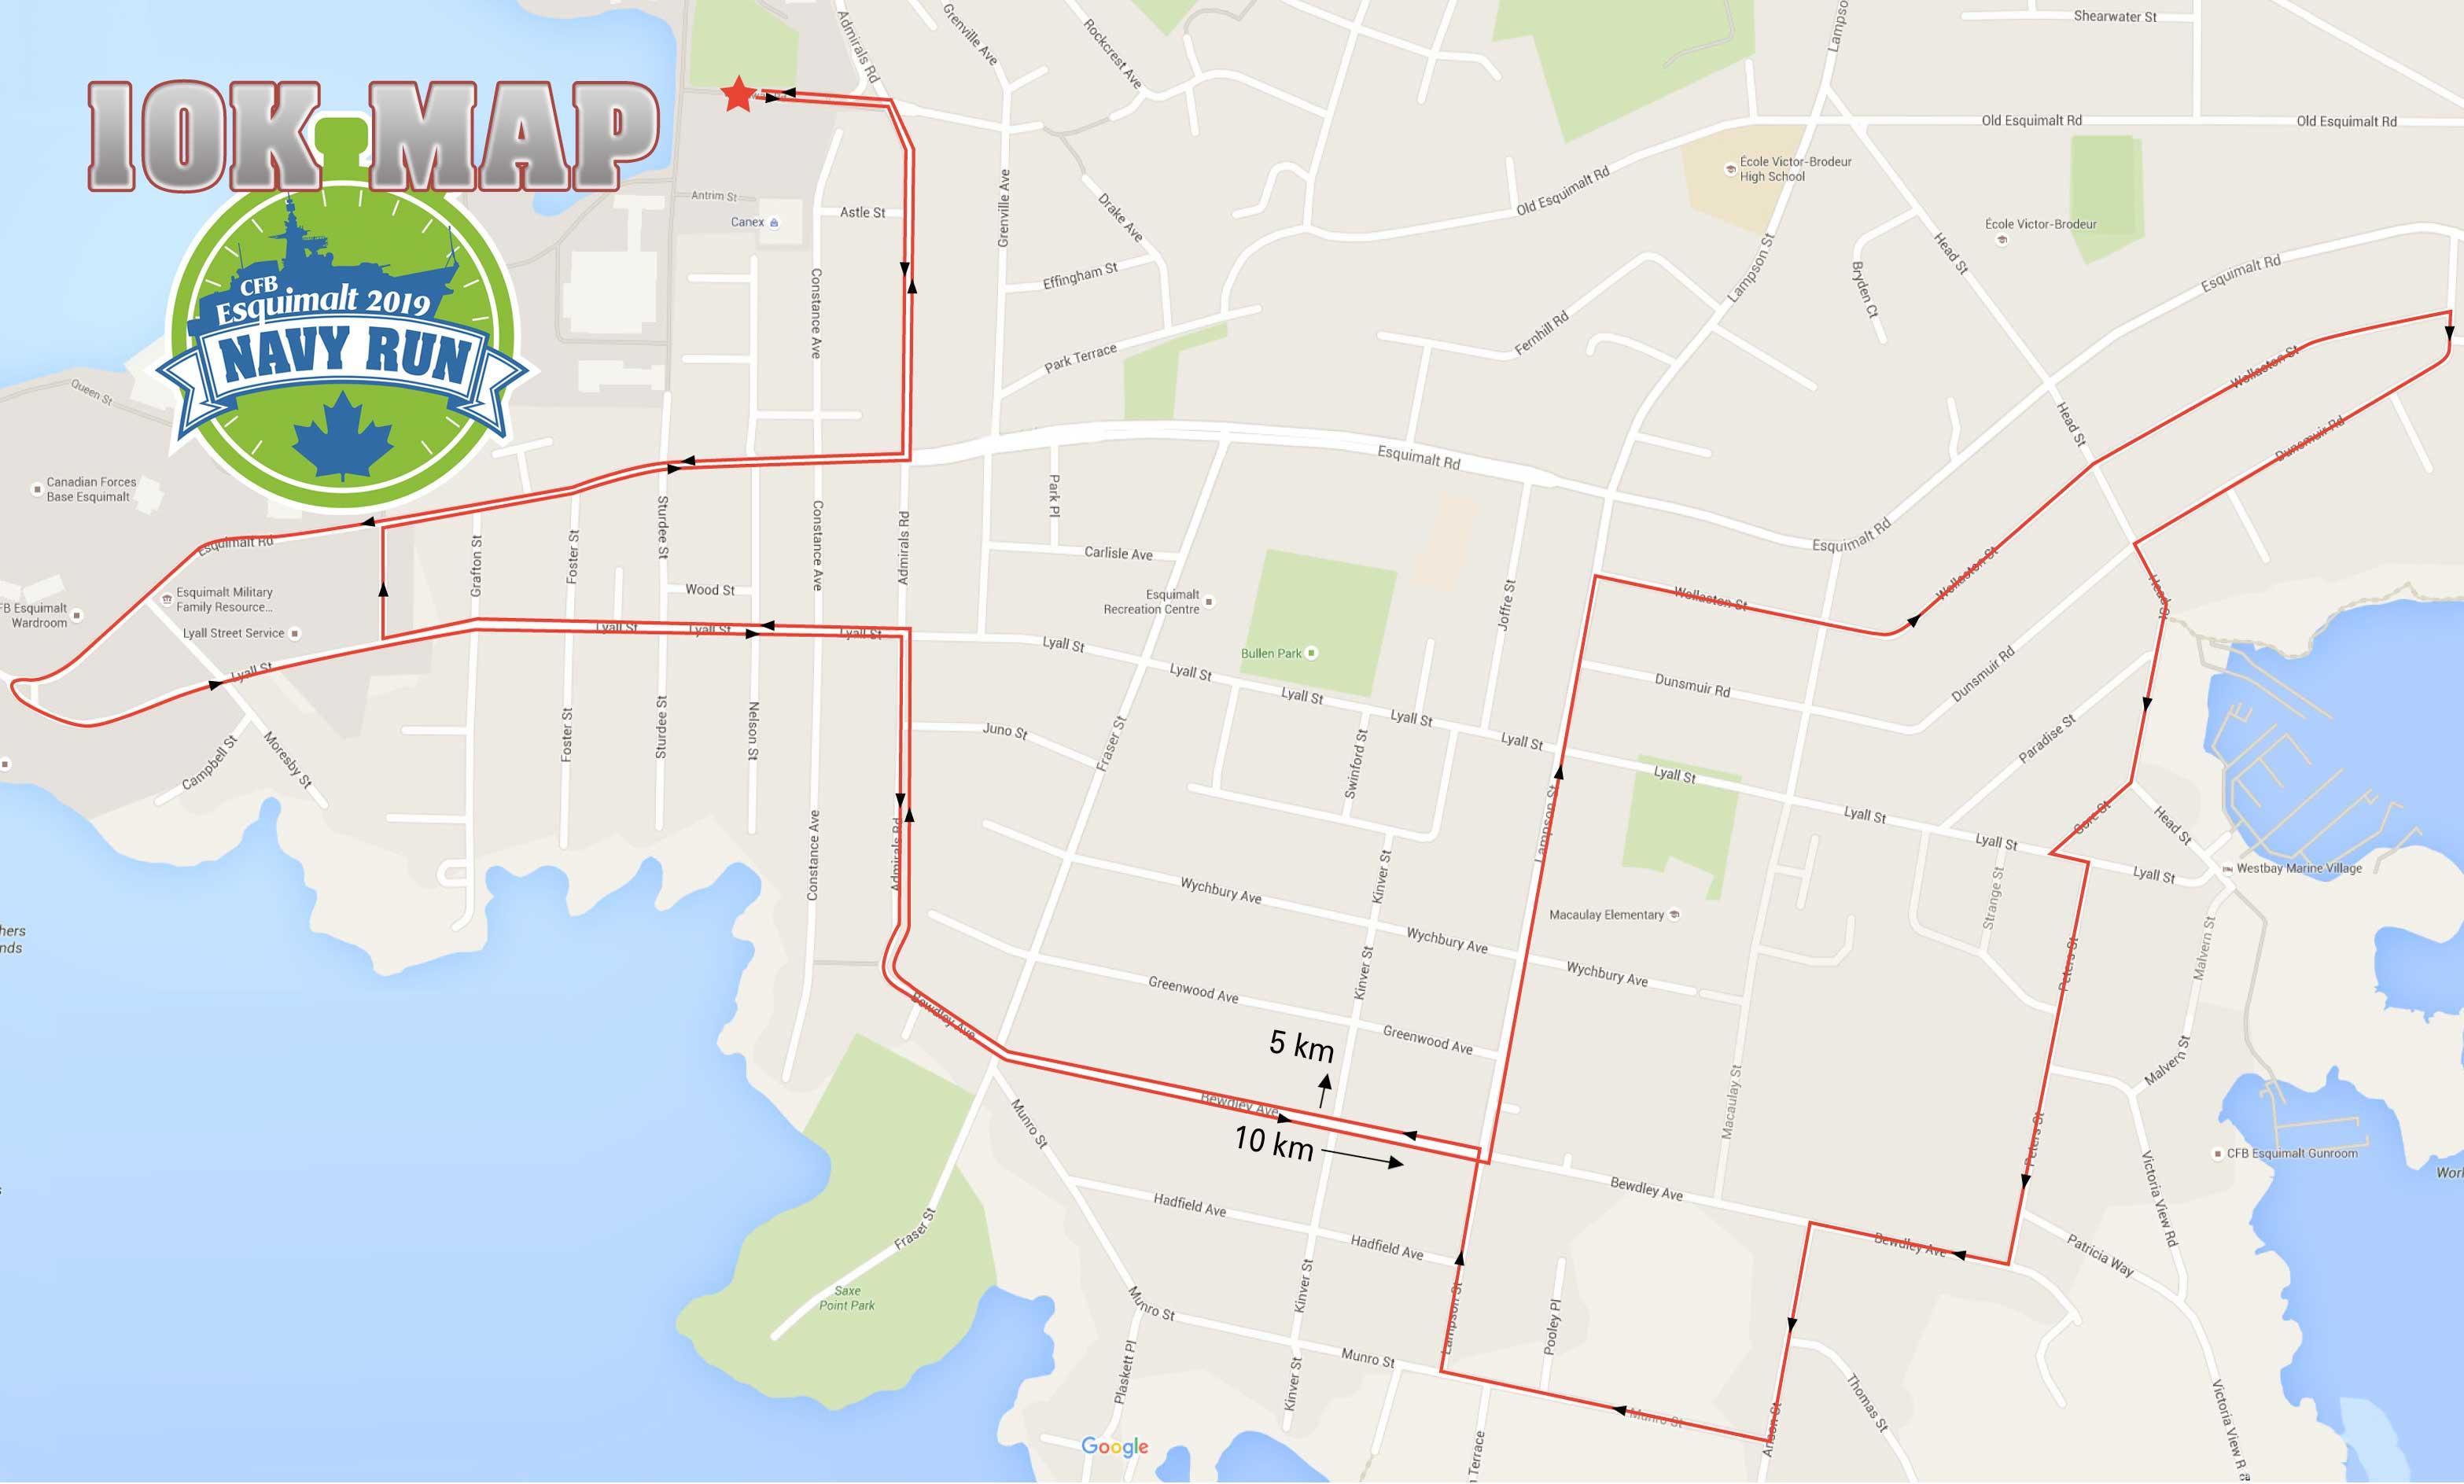 Esquimalt Navy Run 2019 10 km route map